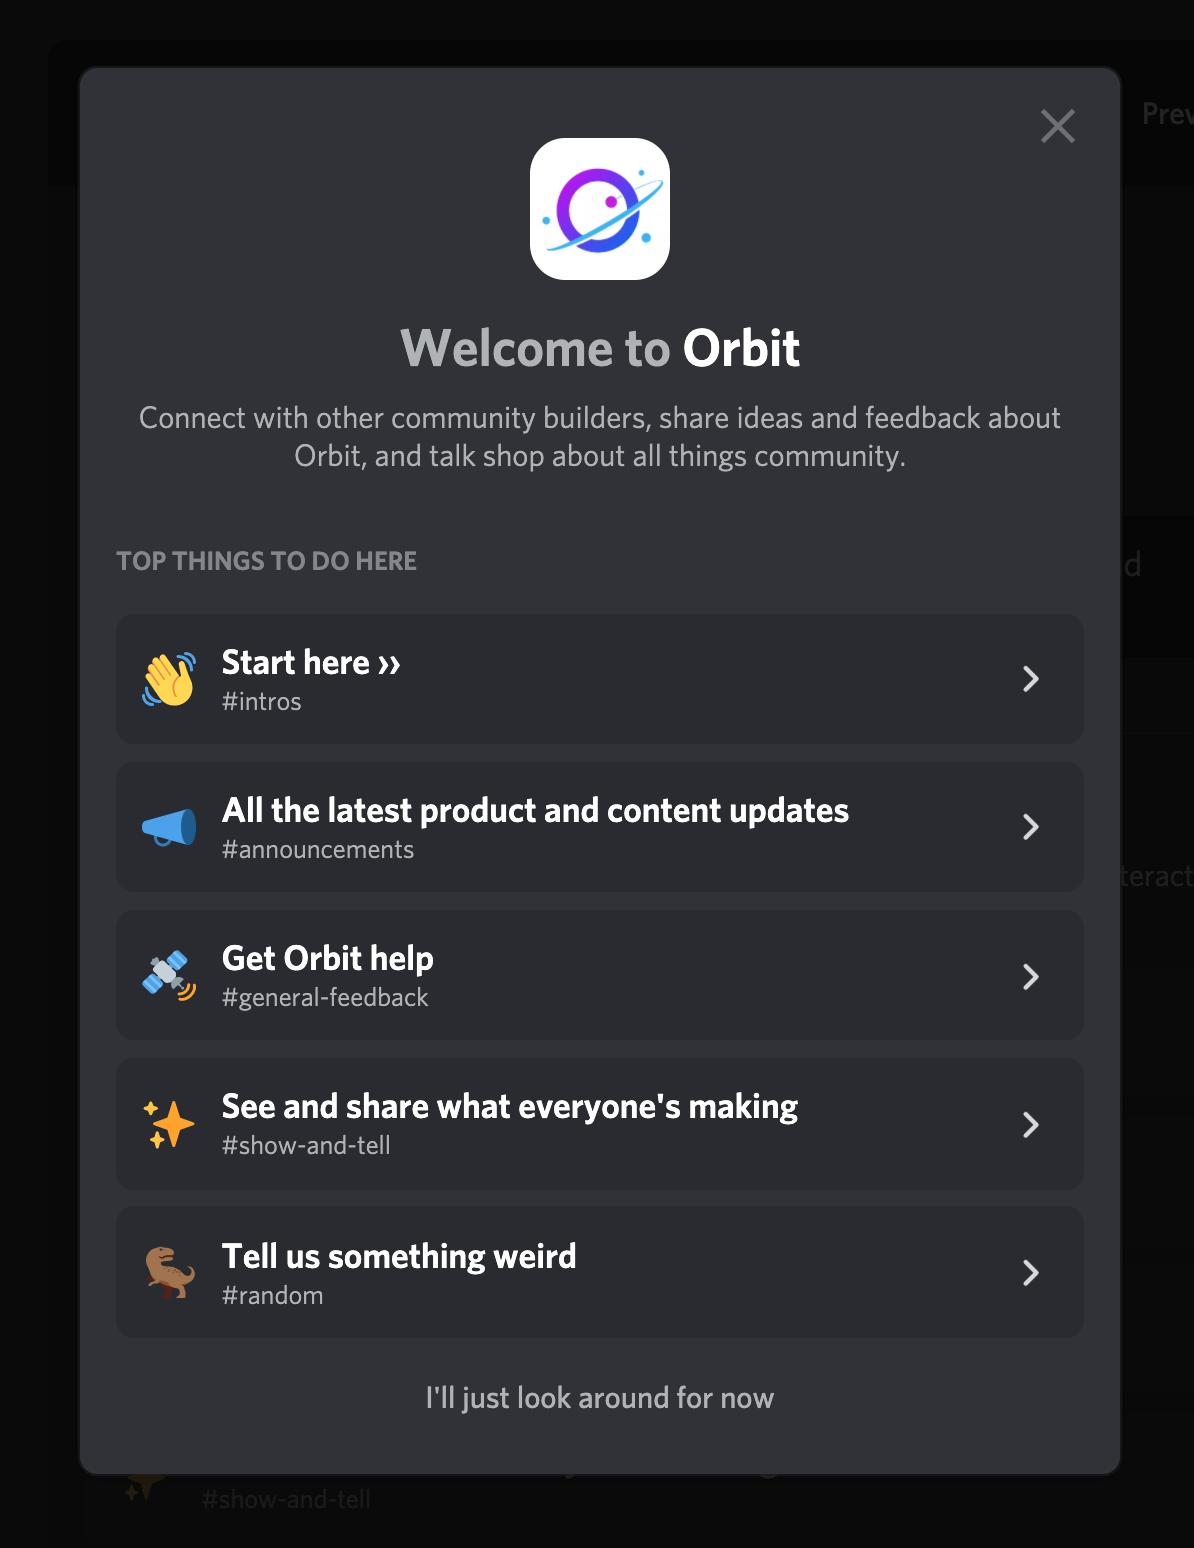 Screenshot of the Orbit Discord Welcome Message